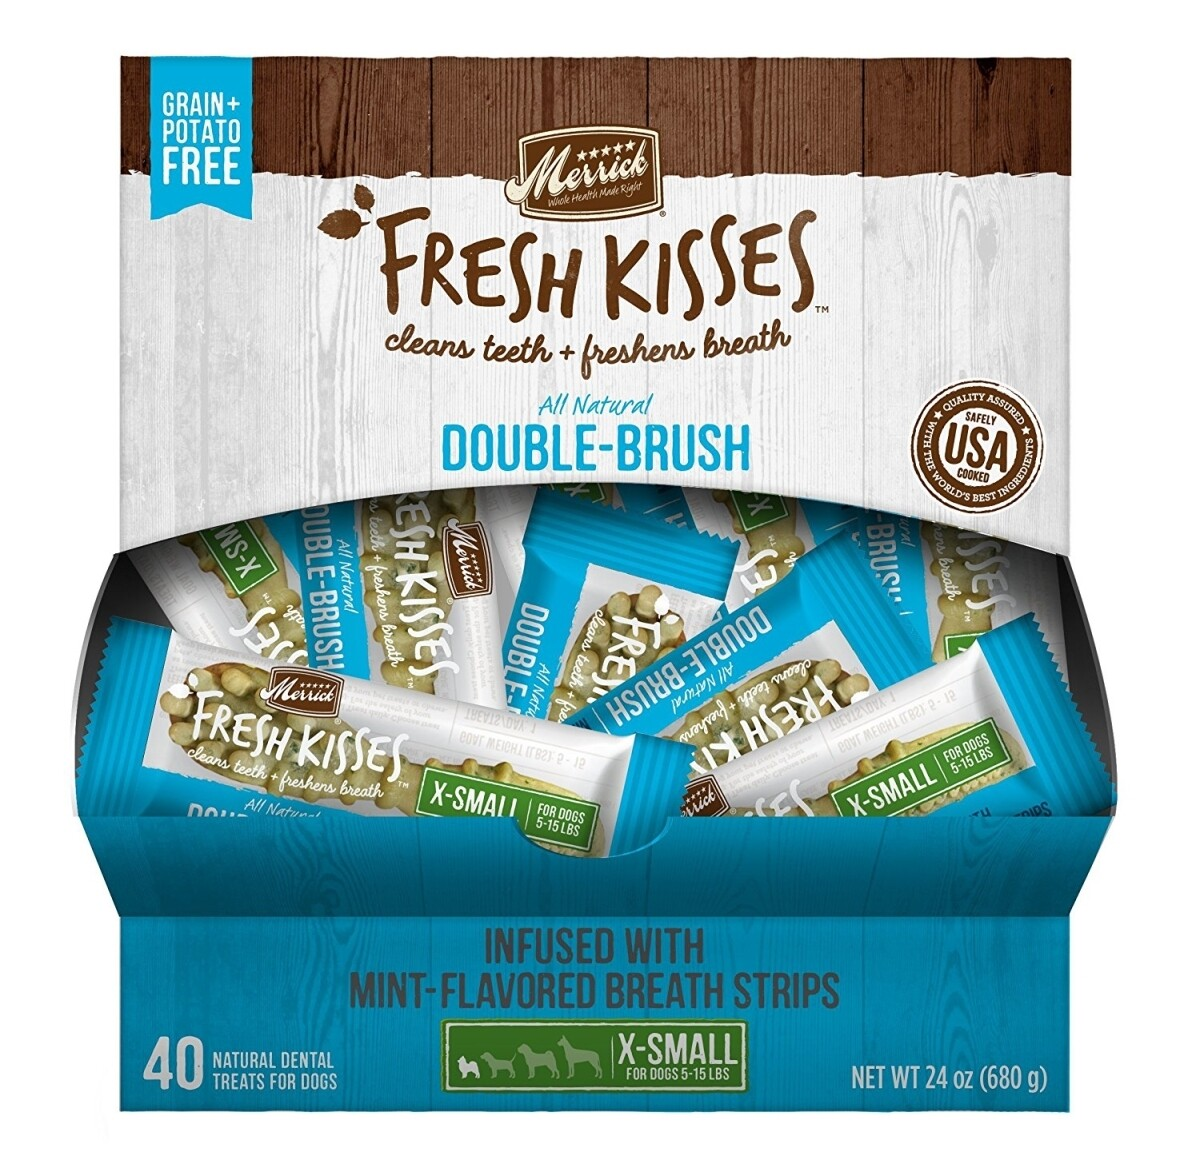 Merrick Fresh Kisses Mint Breath Strips Extra Small Dental Dog Treat - 40 Count #66036 (01.19) (A.M4)